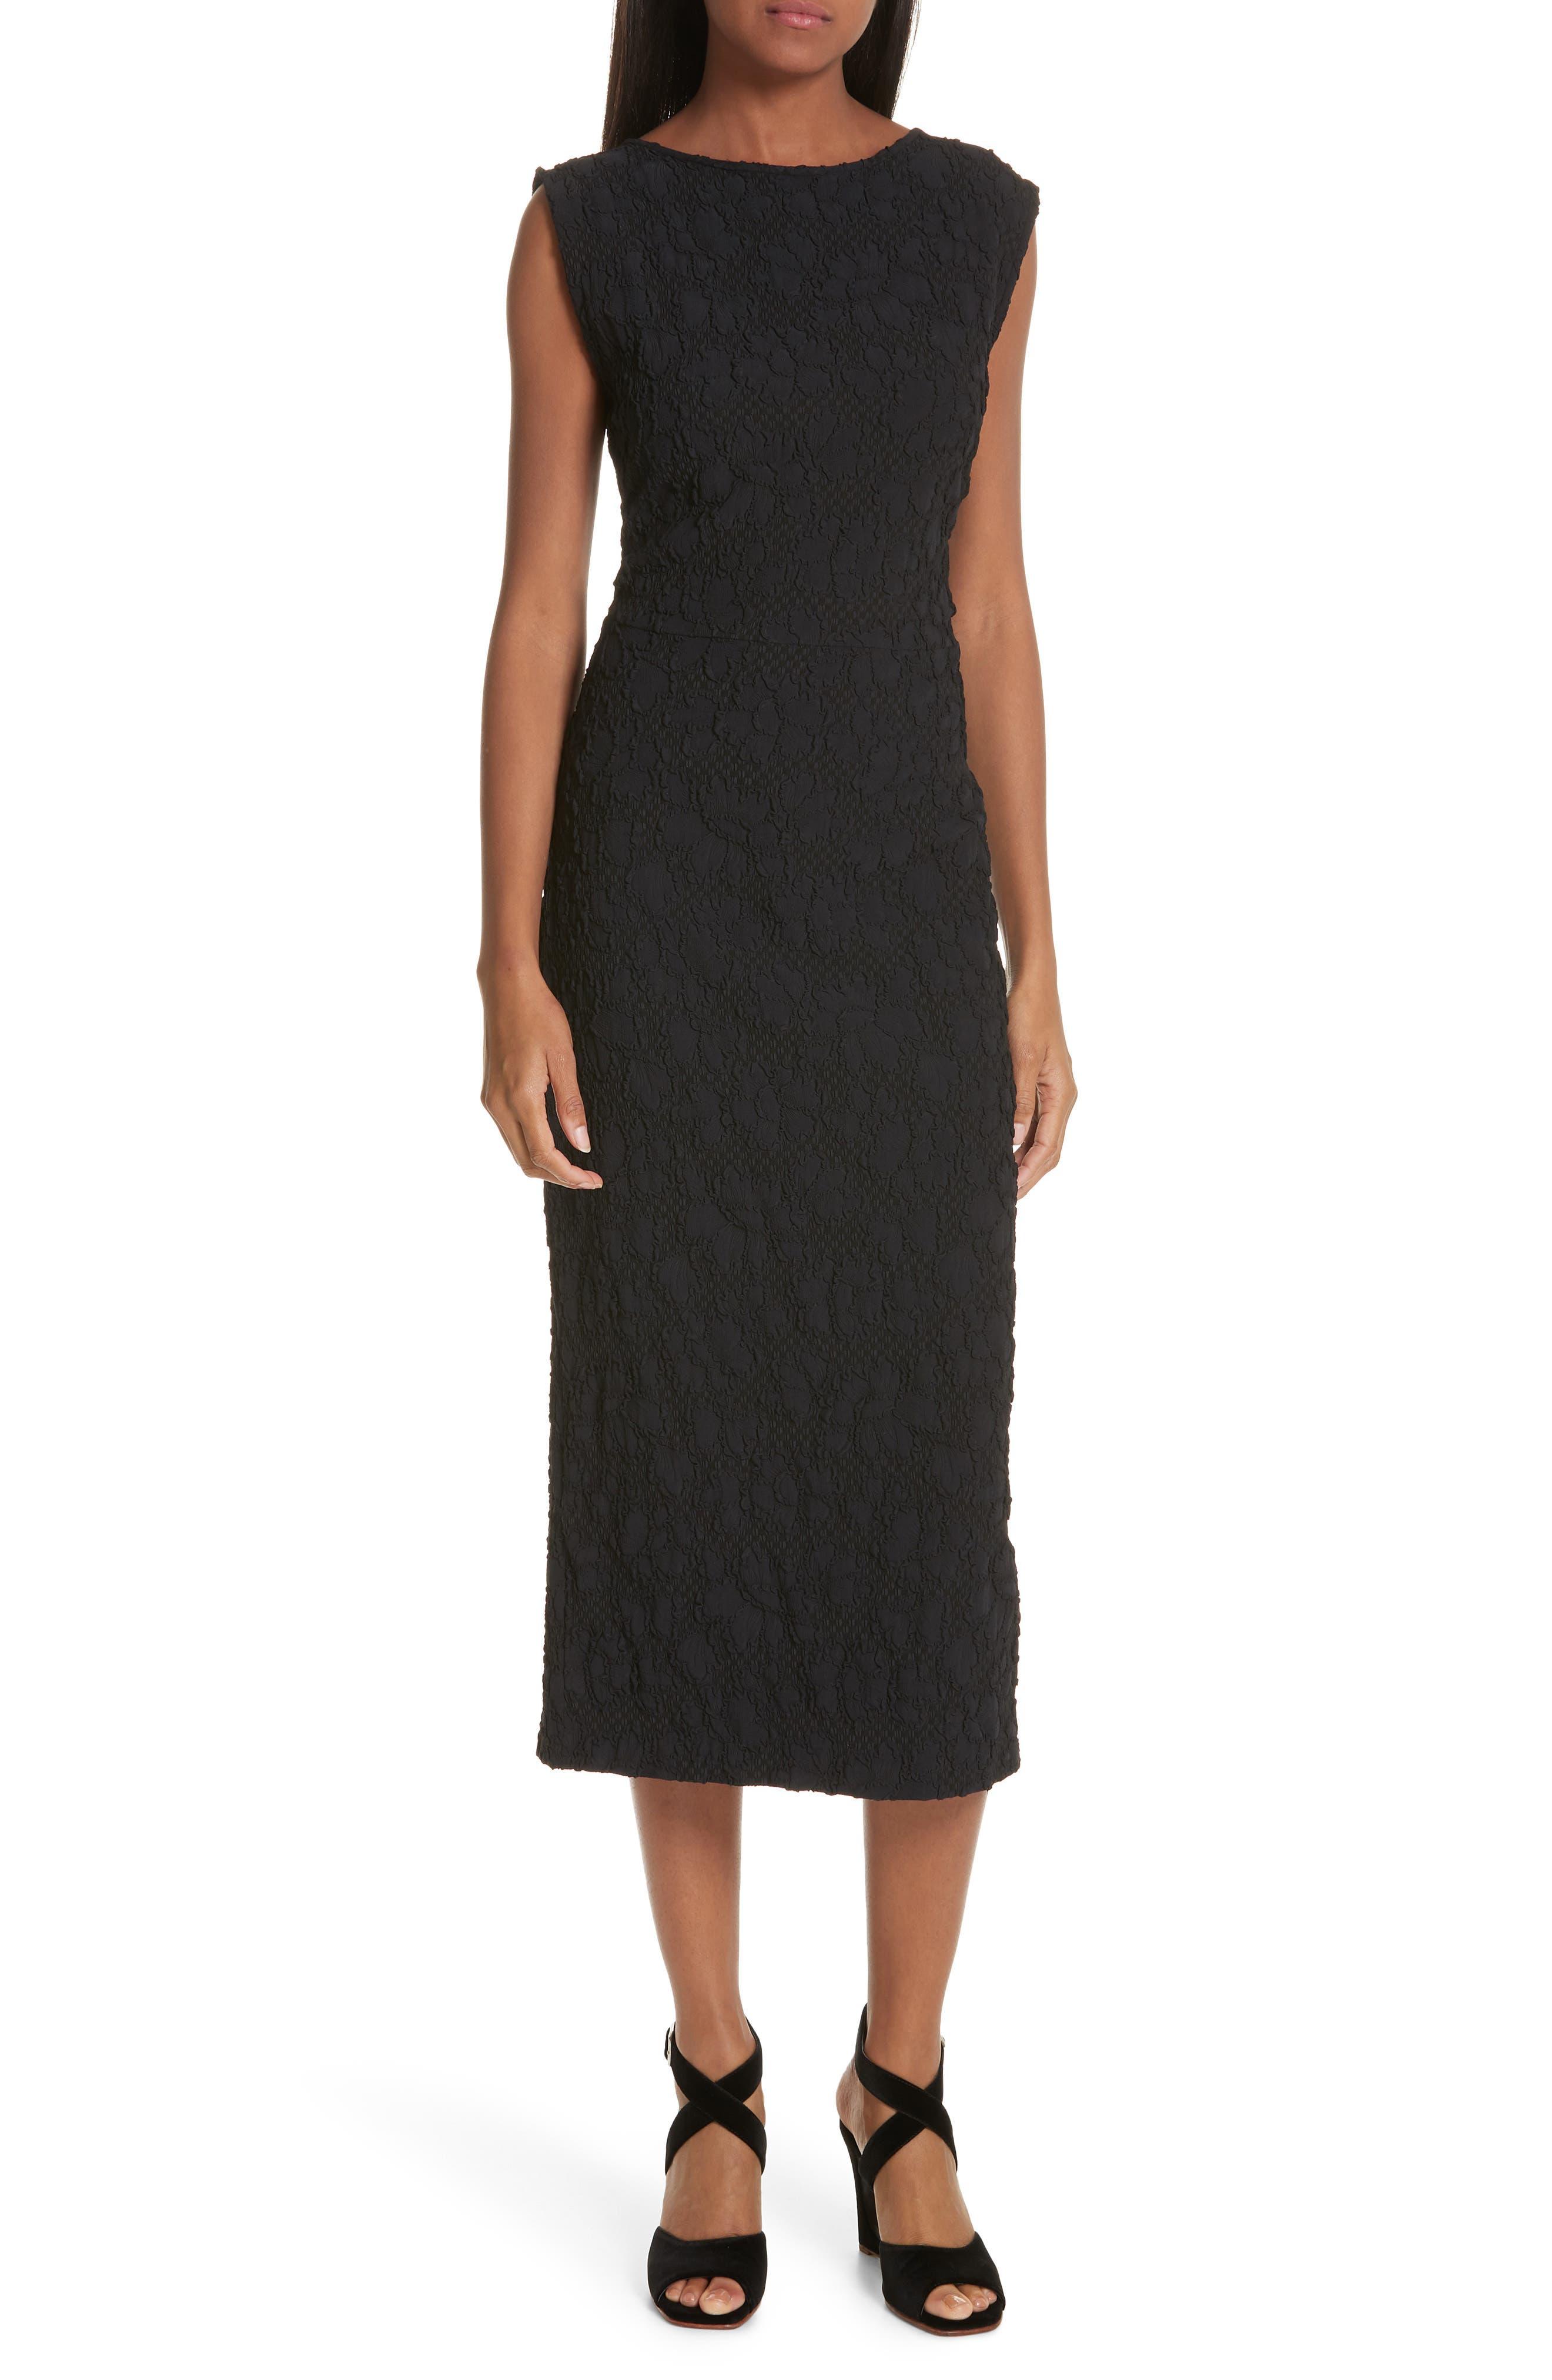 Rachel Comey Medina Floral Jacquard Sheath Dress, Black